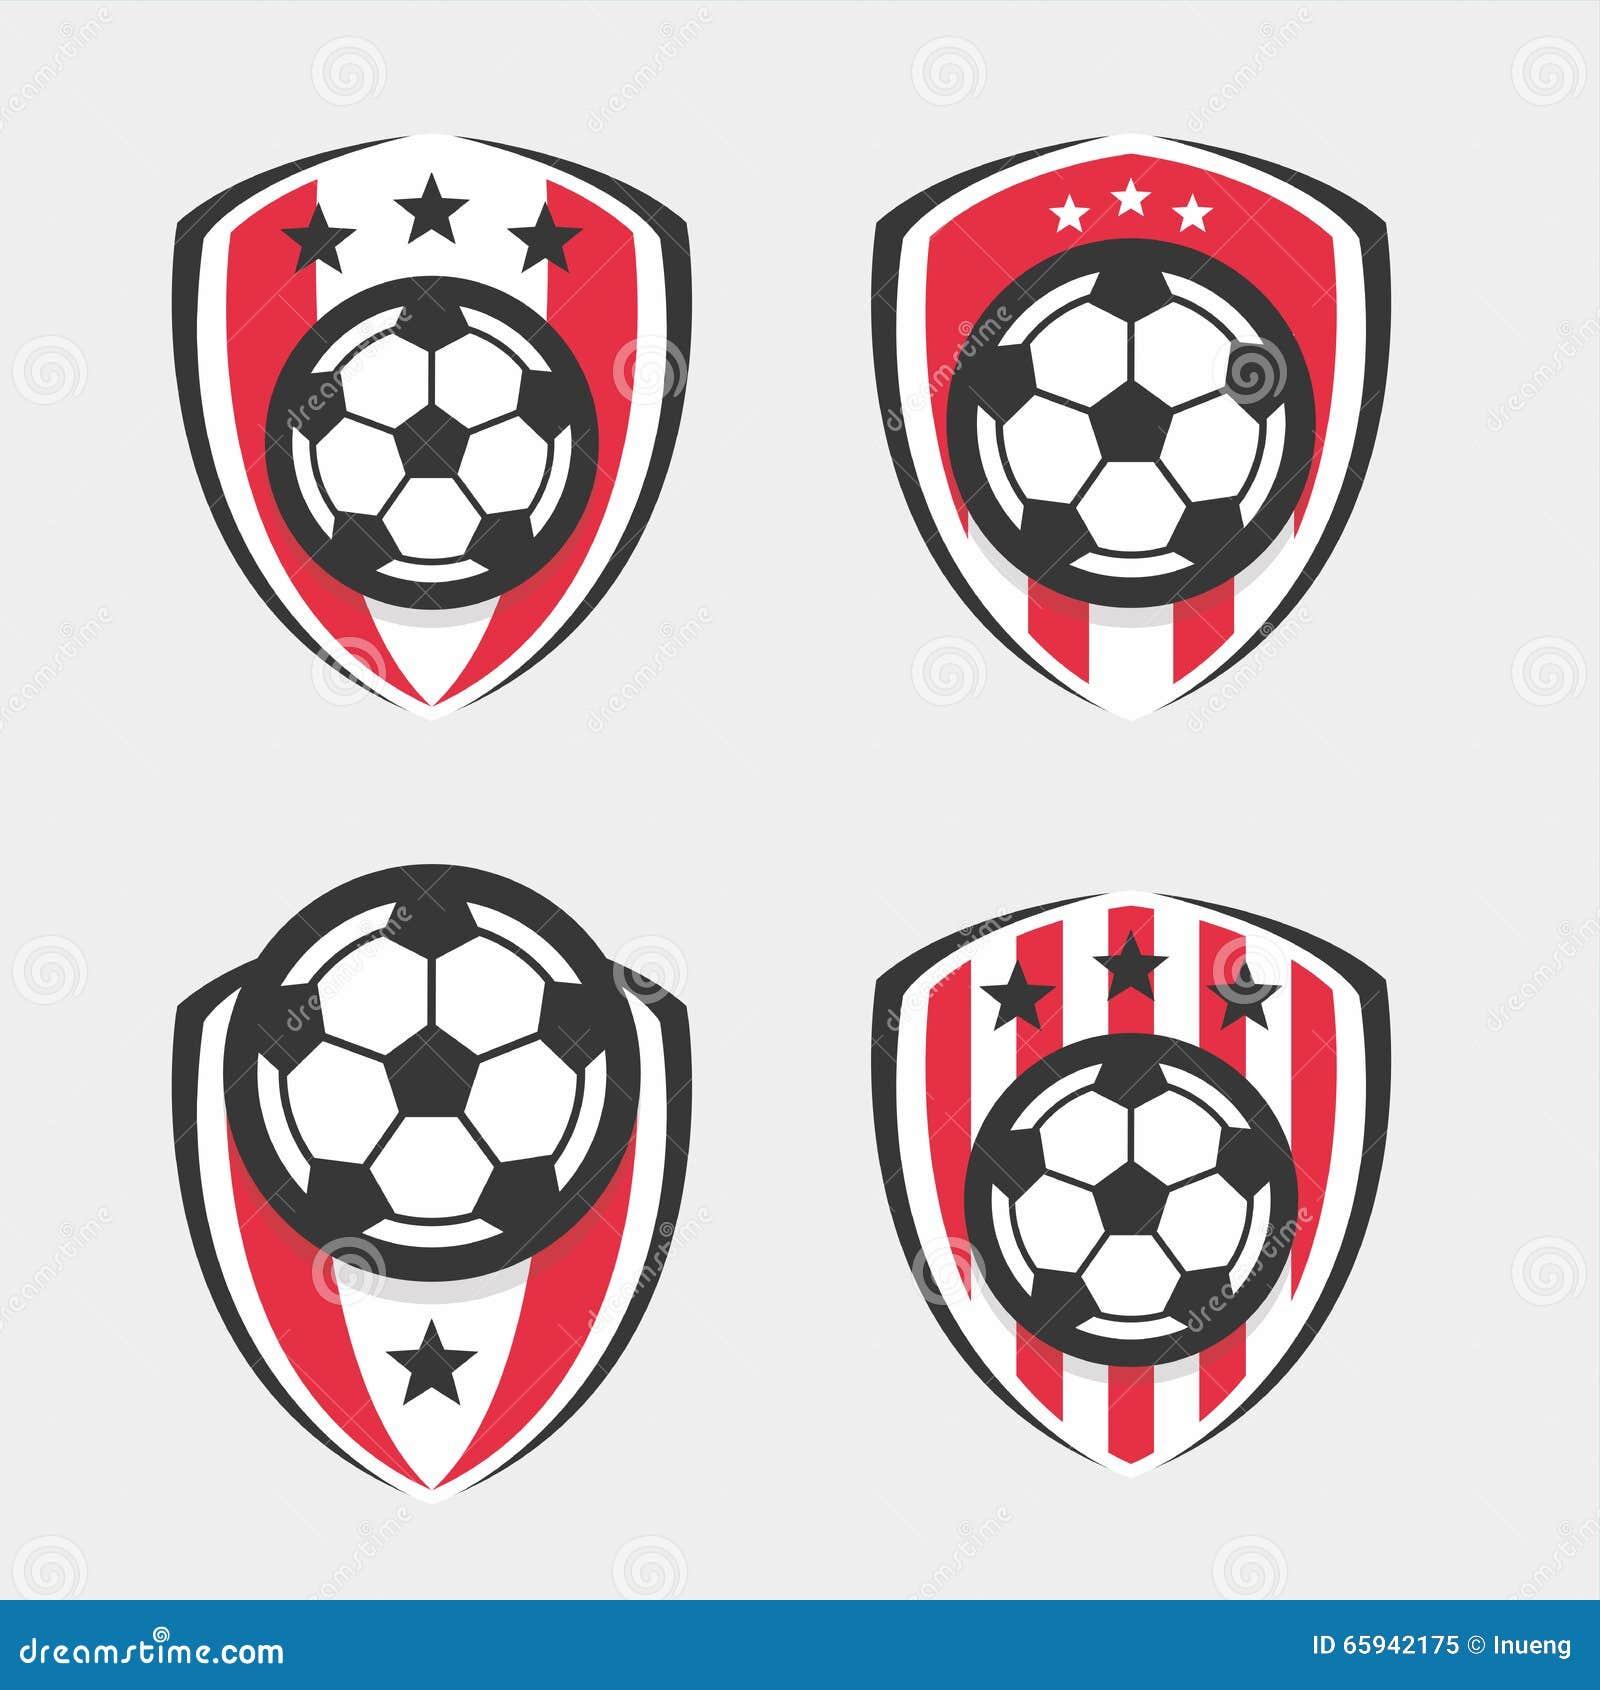 Fuu00dfball-Logo oder Fuu00dfball-Verein-Zeichen-Ausweis-Satz Auch im corel ...